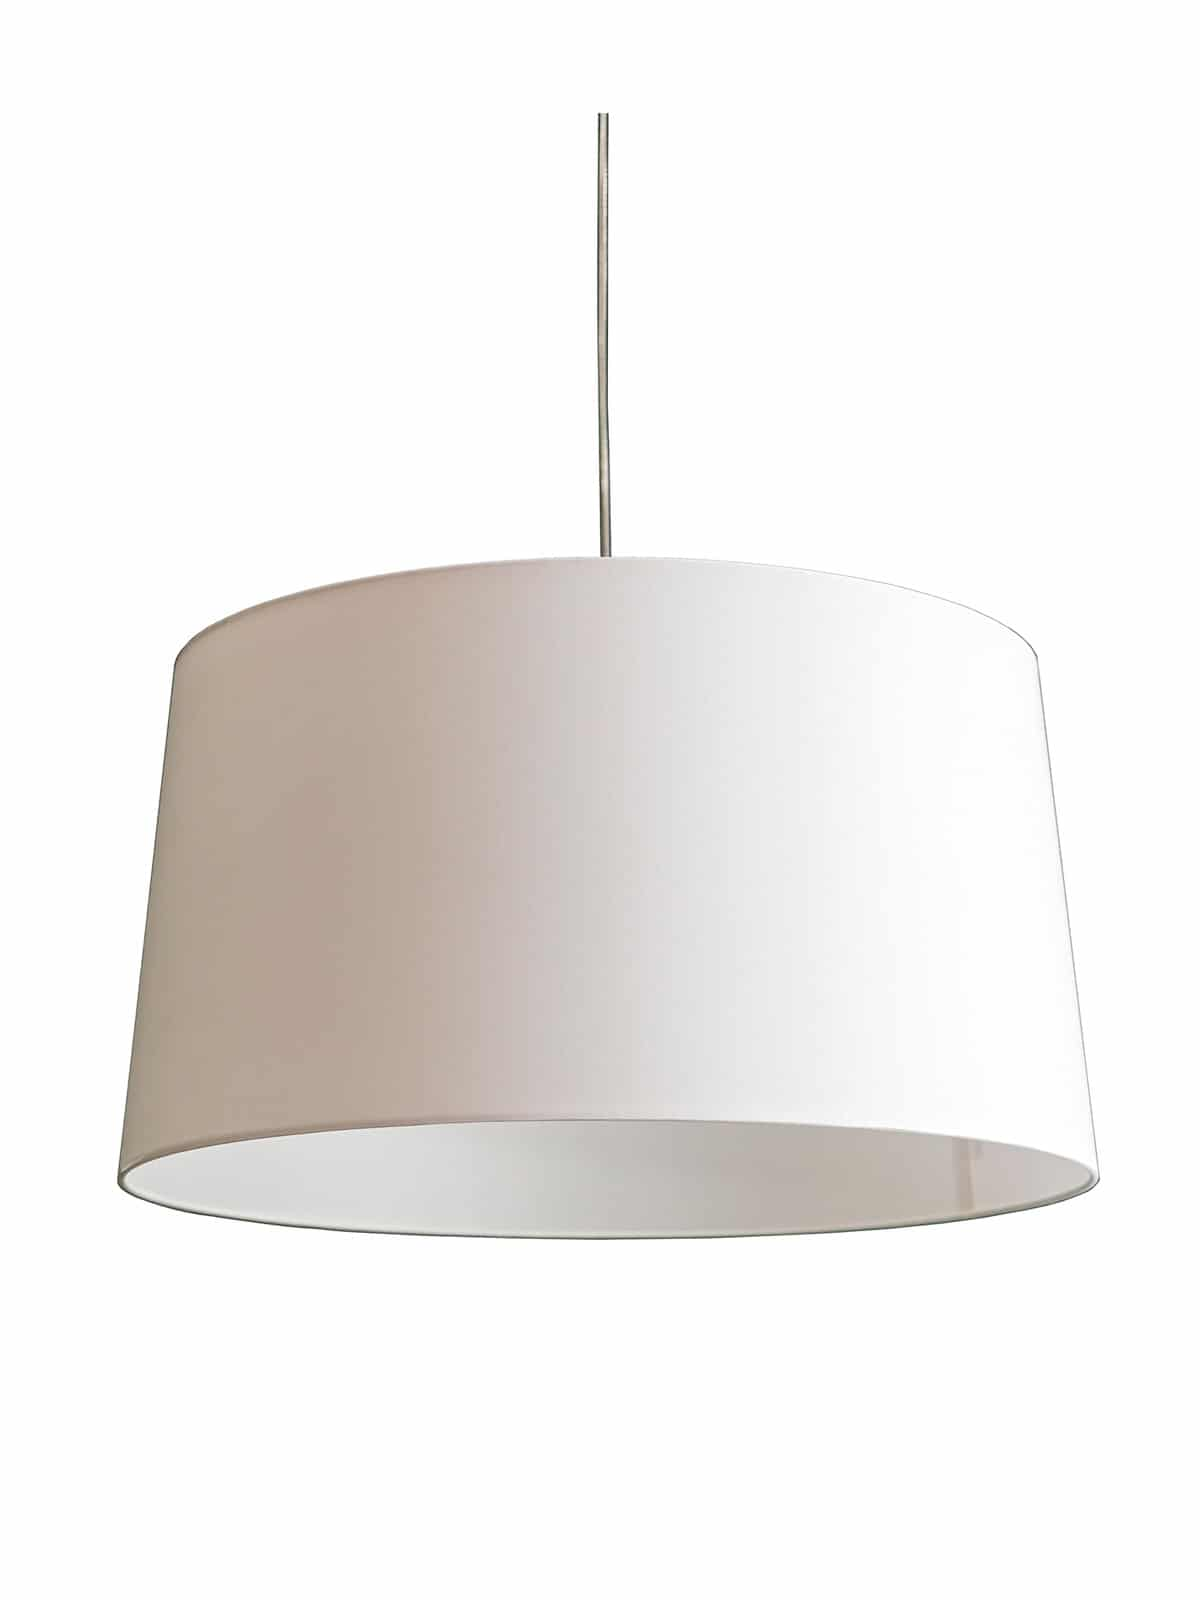 lea gold lampen leuchten designerleuchten online berlin design. Black Bedroom Furniture Sets. Home Design Ideas